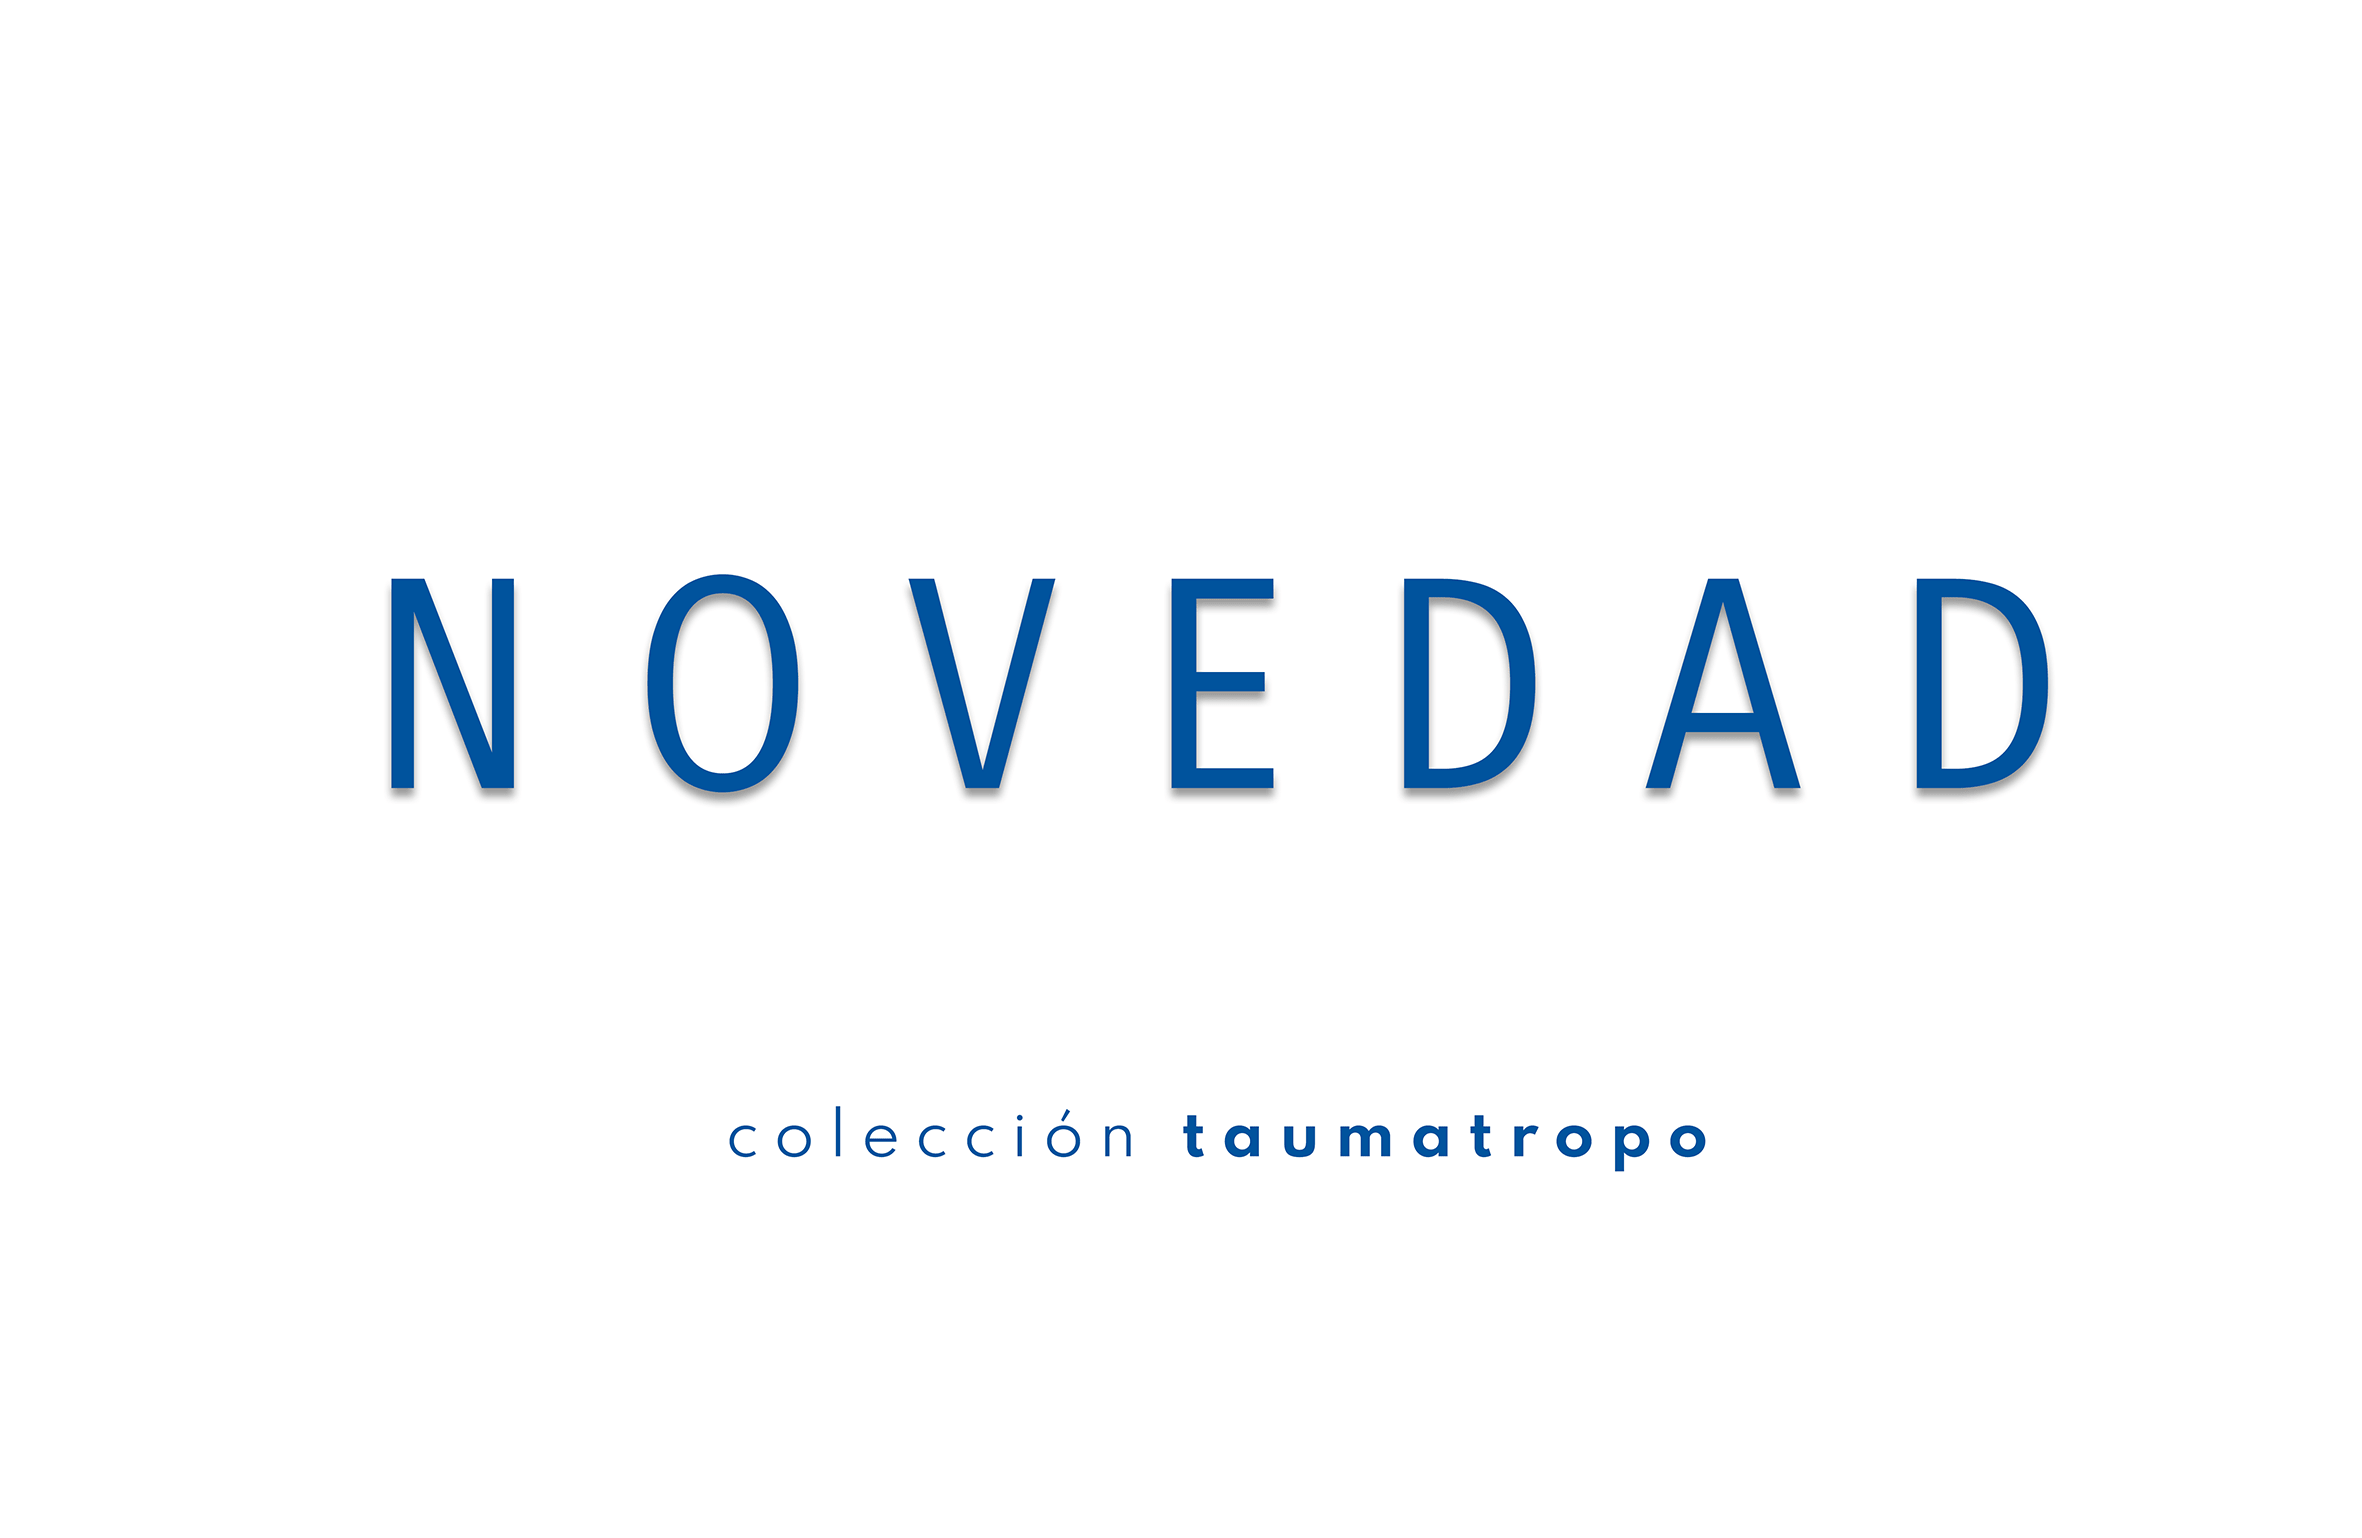 Novedad_peq-min